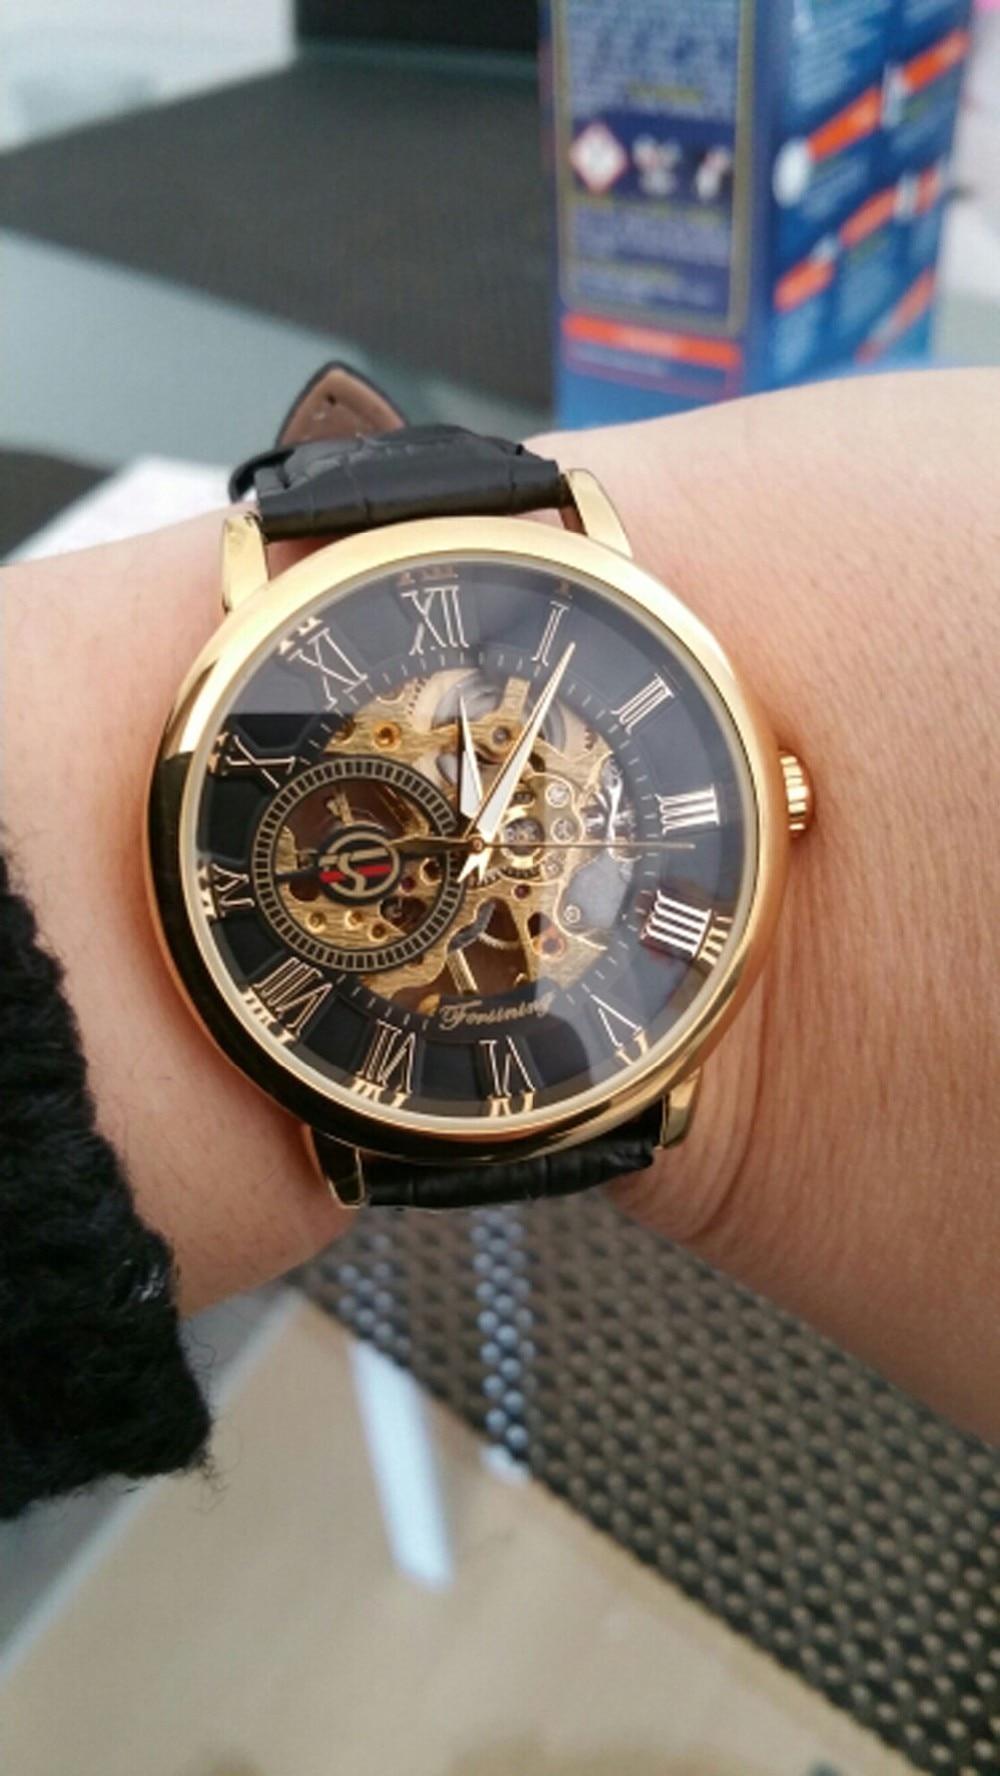 Hacec9e54d25a48e0841d13ede01b90a6m Forsining 3d Logo Design Hollow Engraving Black Gold Case Leather Skeleton Mechanical Watches Men Luxury Brand Heren Horloge